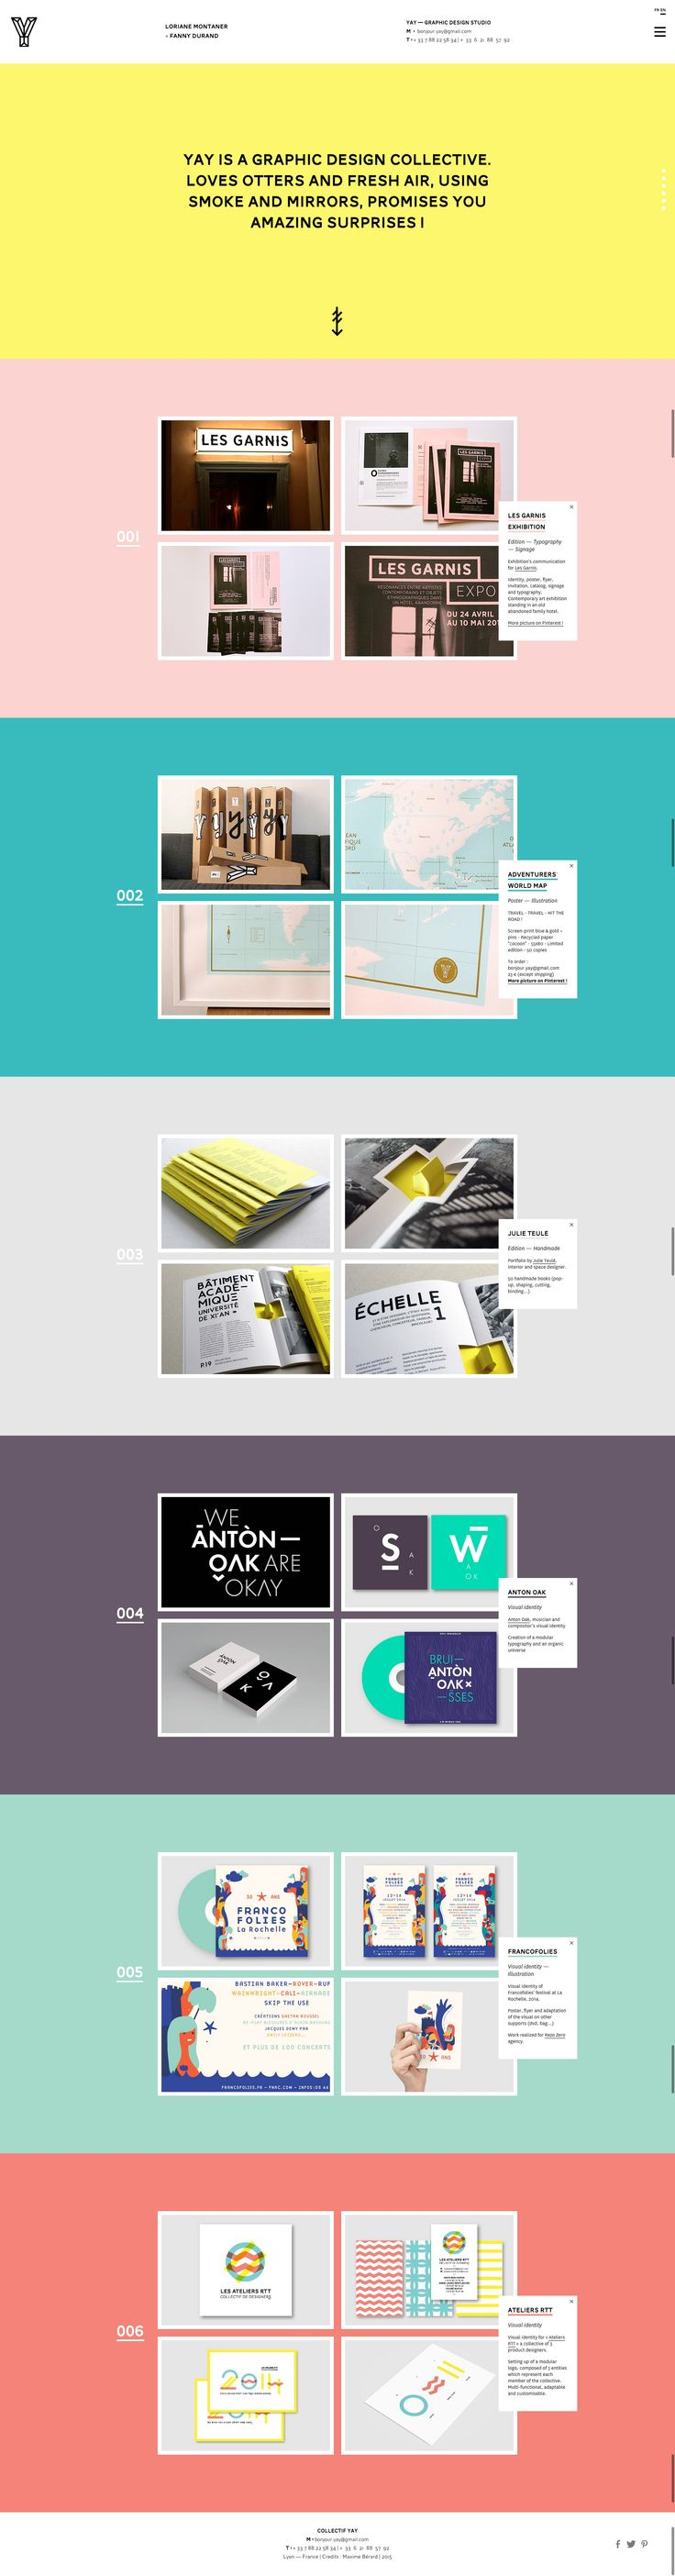 "YAY graphic design studio / 滿喜歡他們的設計風格的,像是向量、pattern, typograpgy等等~網站的互動效果恰到好處,只是作品好像有點少?LIKE:會一直變換的左上角""Y"" / 色彩搭配很活潑鮮明!DISLIKE:上方白色塊資訊部分有點太大,手機版網頁有點擠,好像會跑版,介紹文字擋到圖XX不見了。"